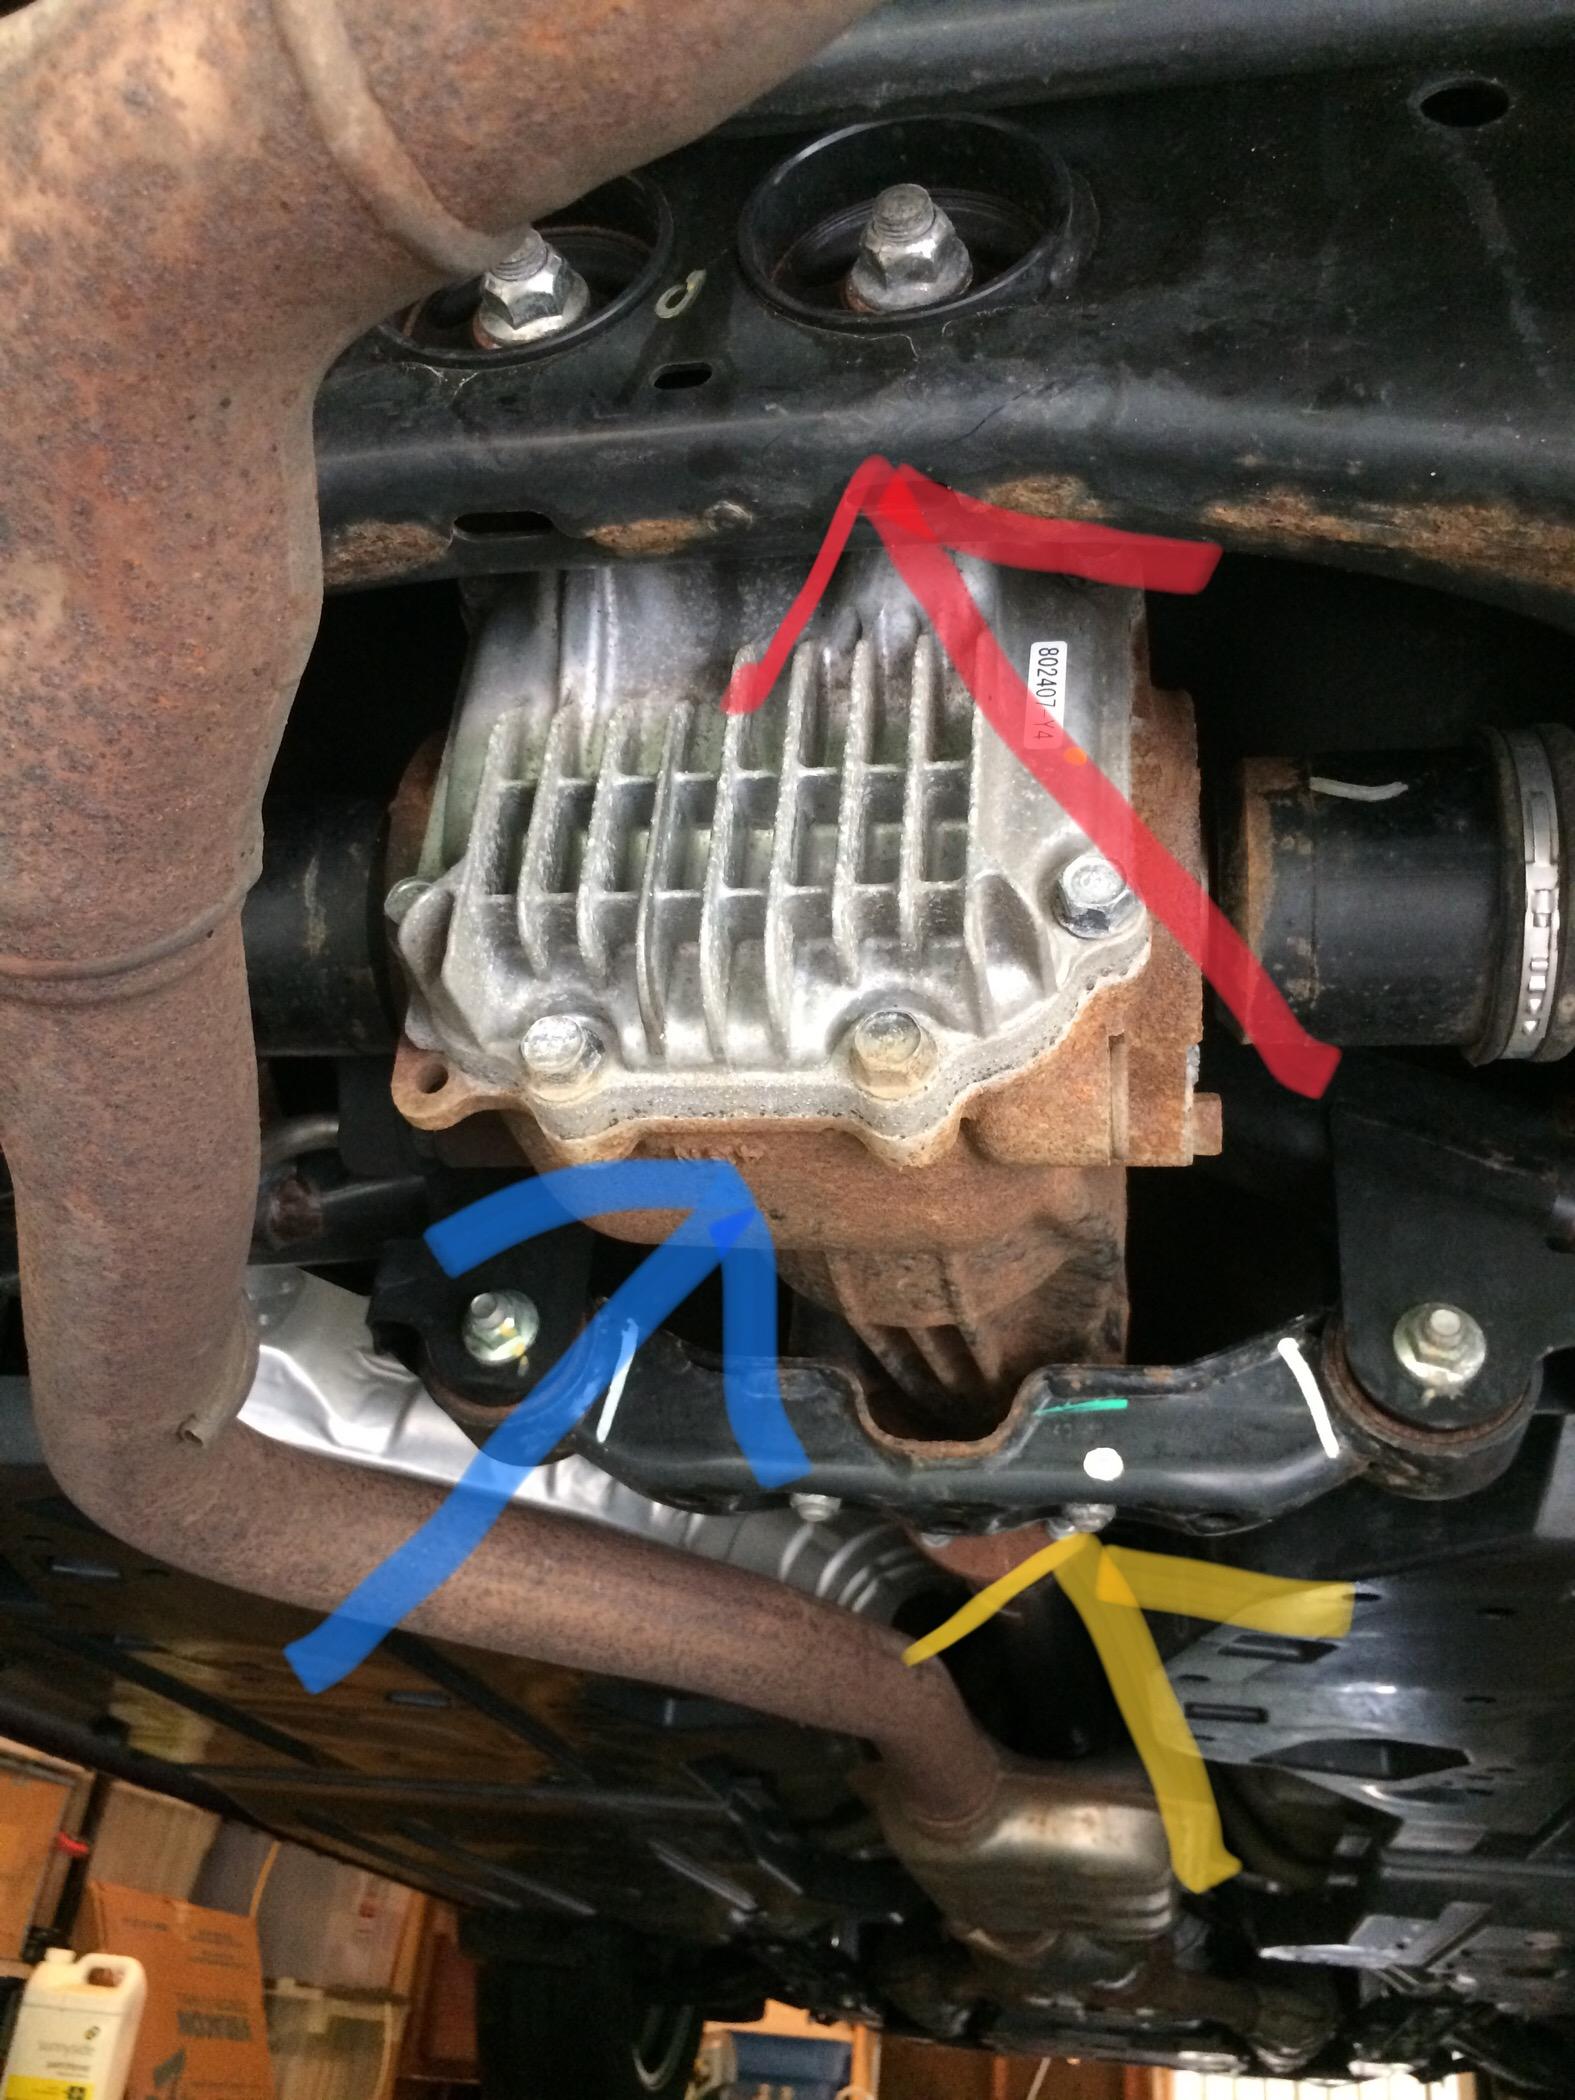 subaru outback jack points subaru cars review release raiacarscom